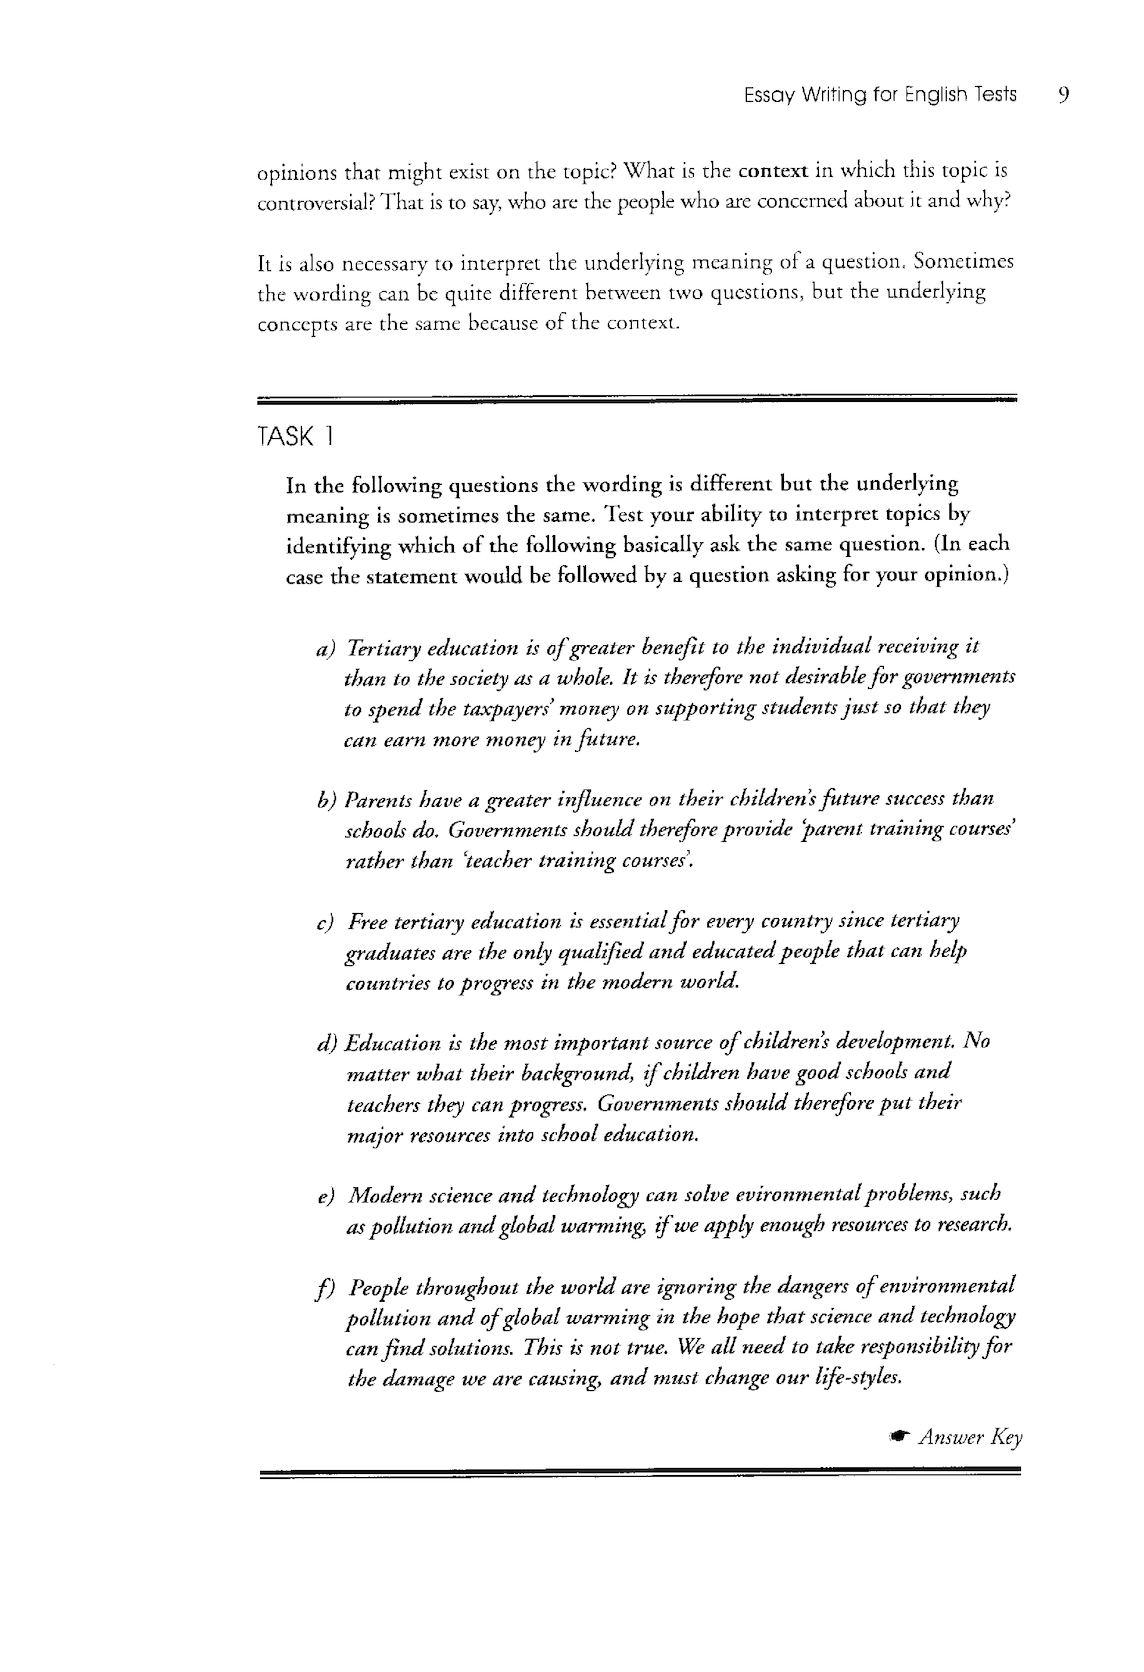 Global warming lomg essay in english